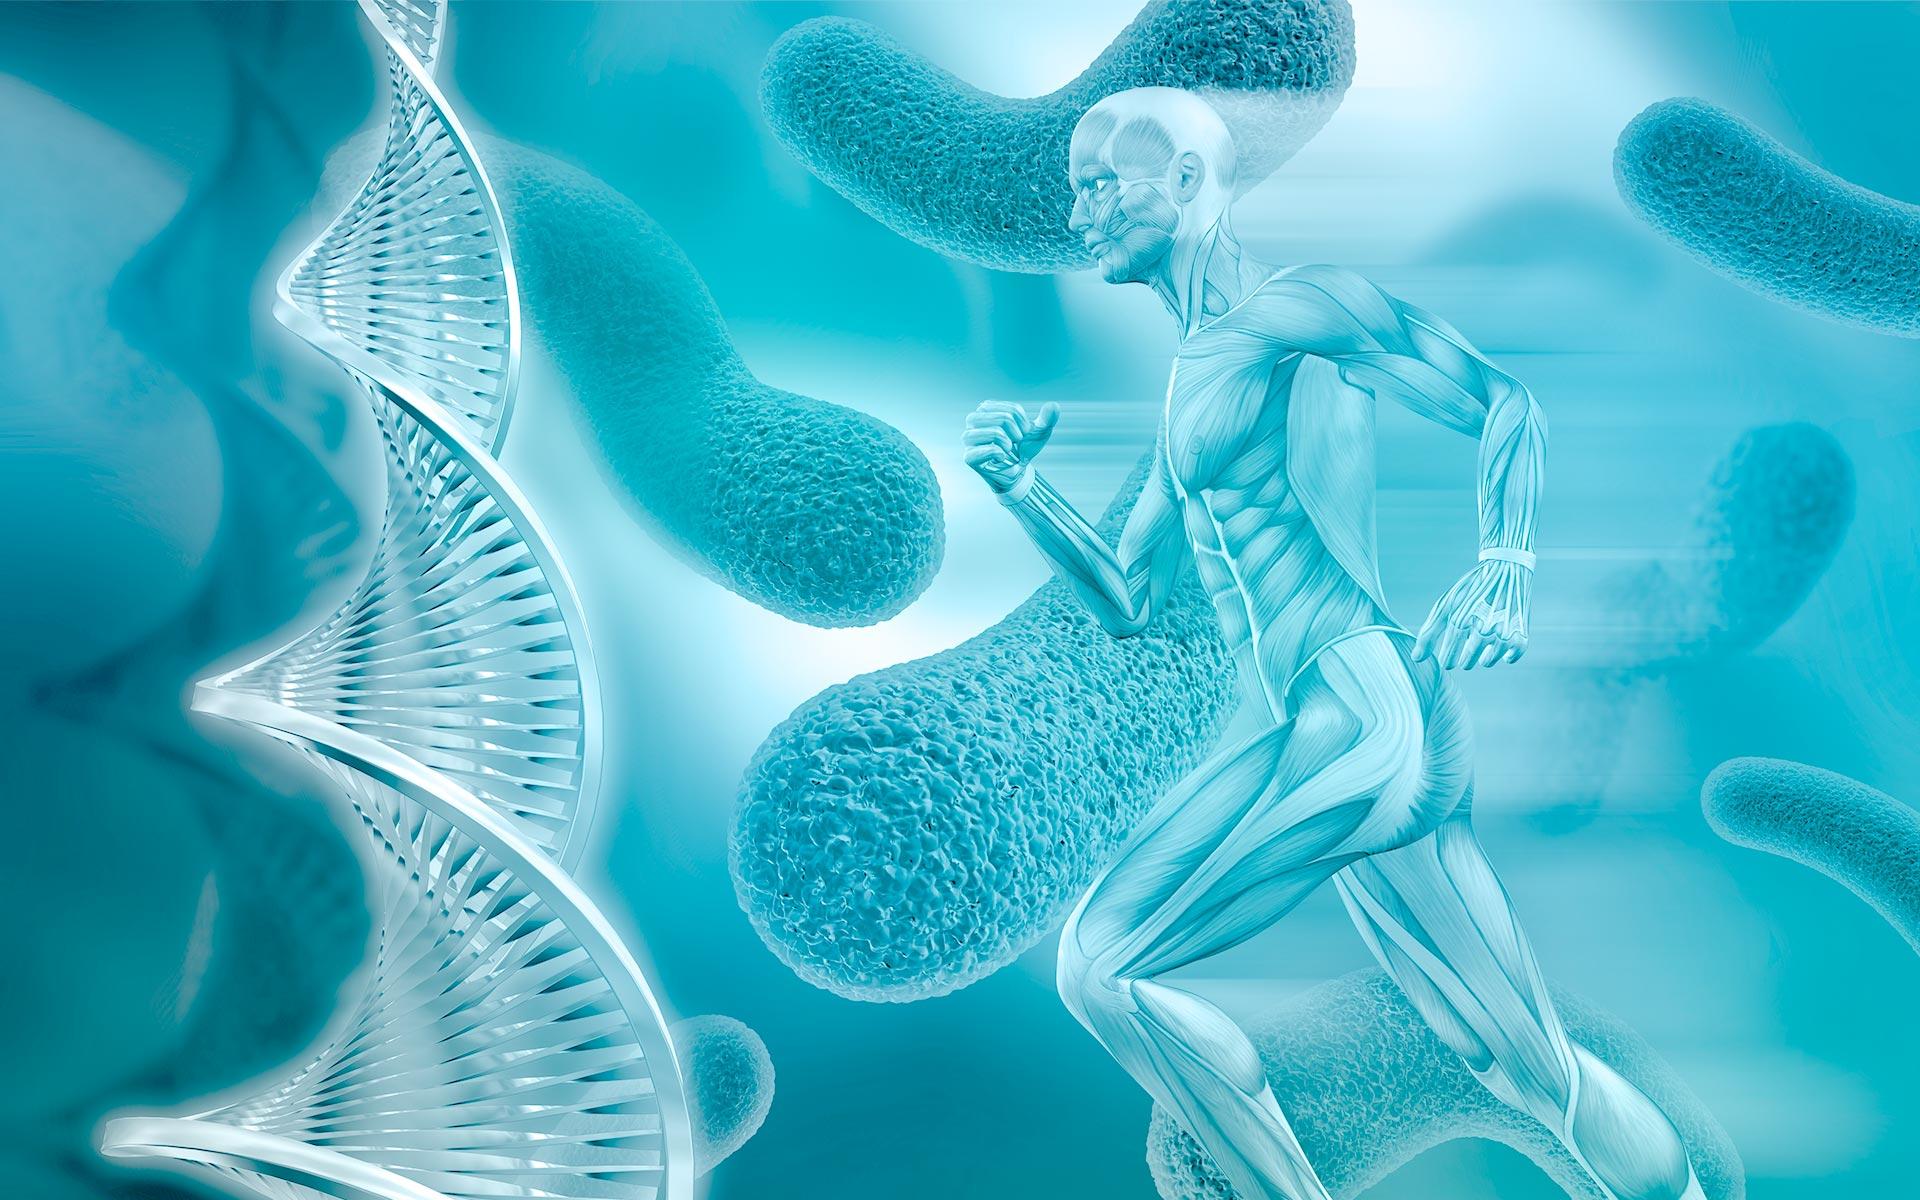 banner-fisiologia-web-2020